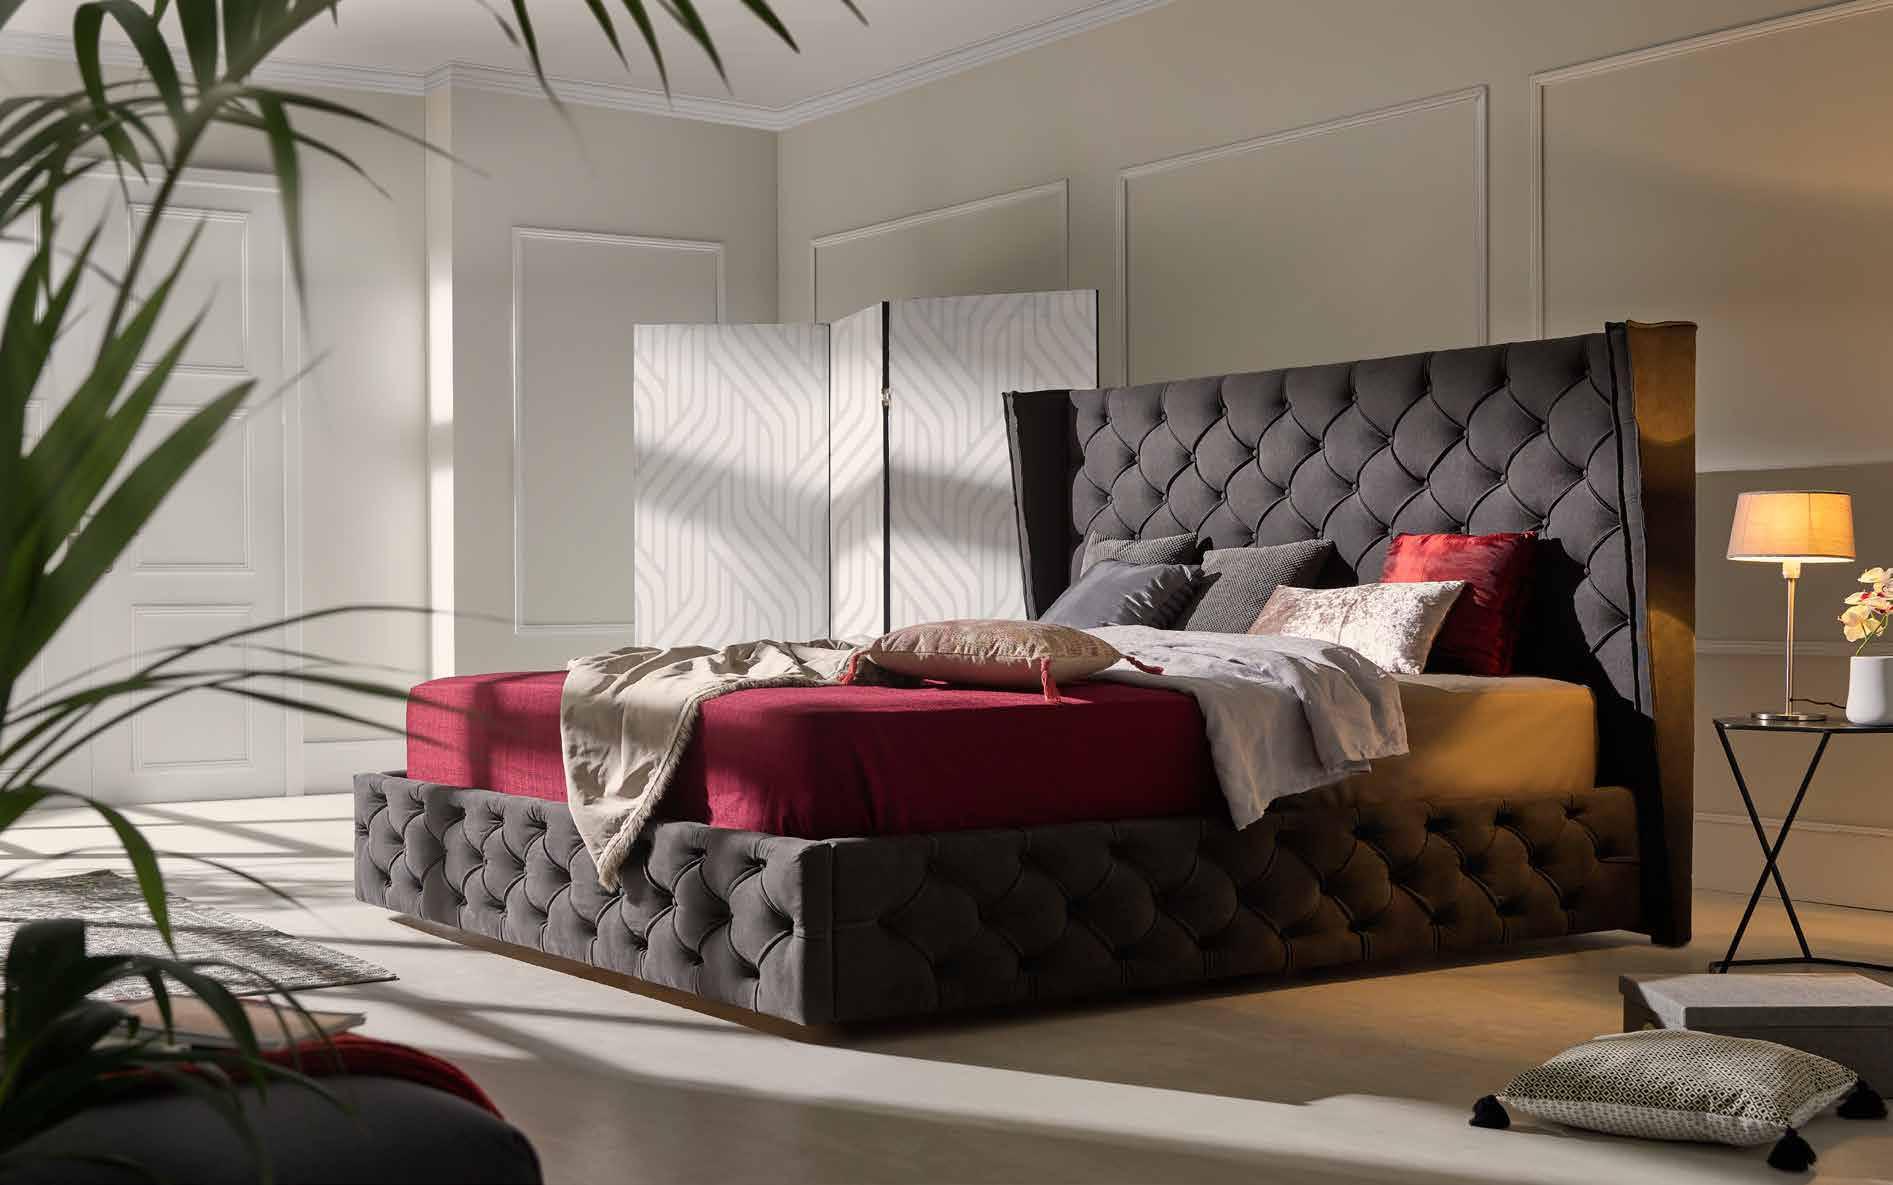 cabeceros-tapizados-muebles-paco-caballero-1837-5c8fd842c8868